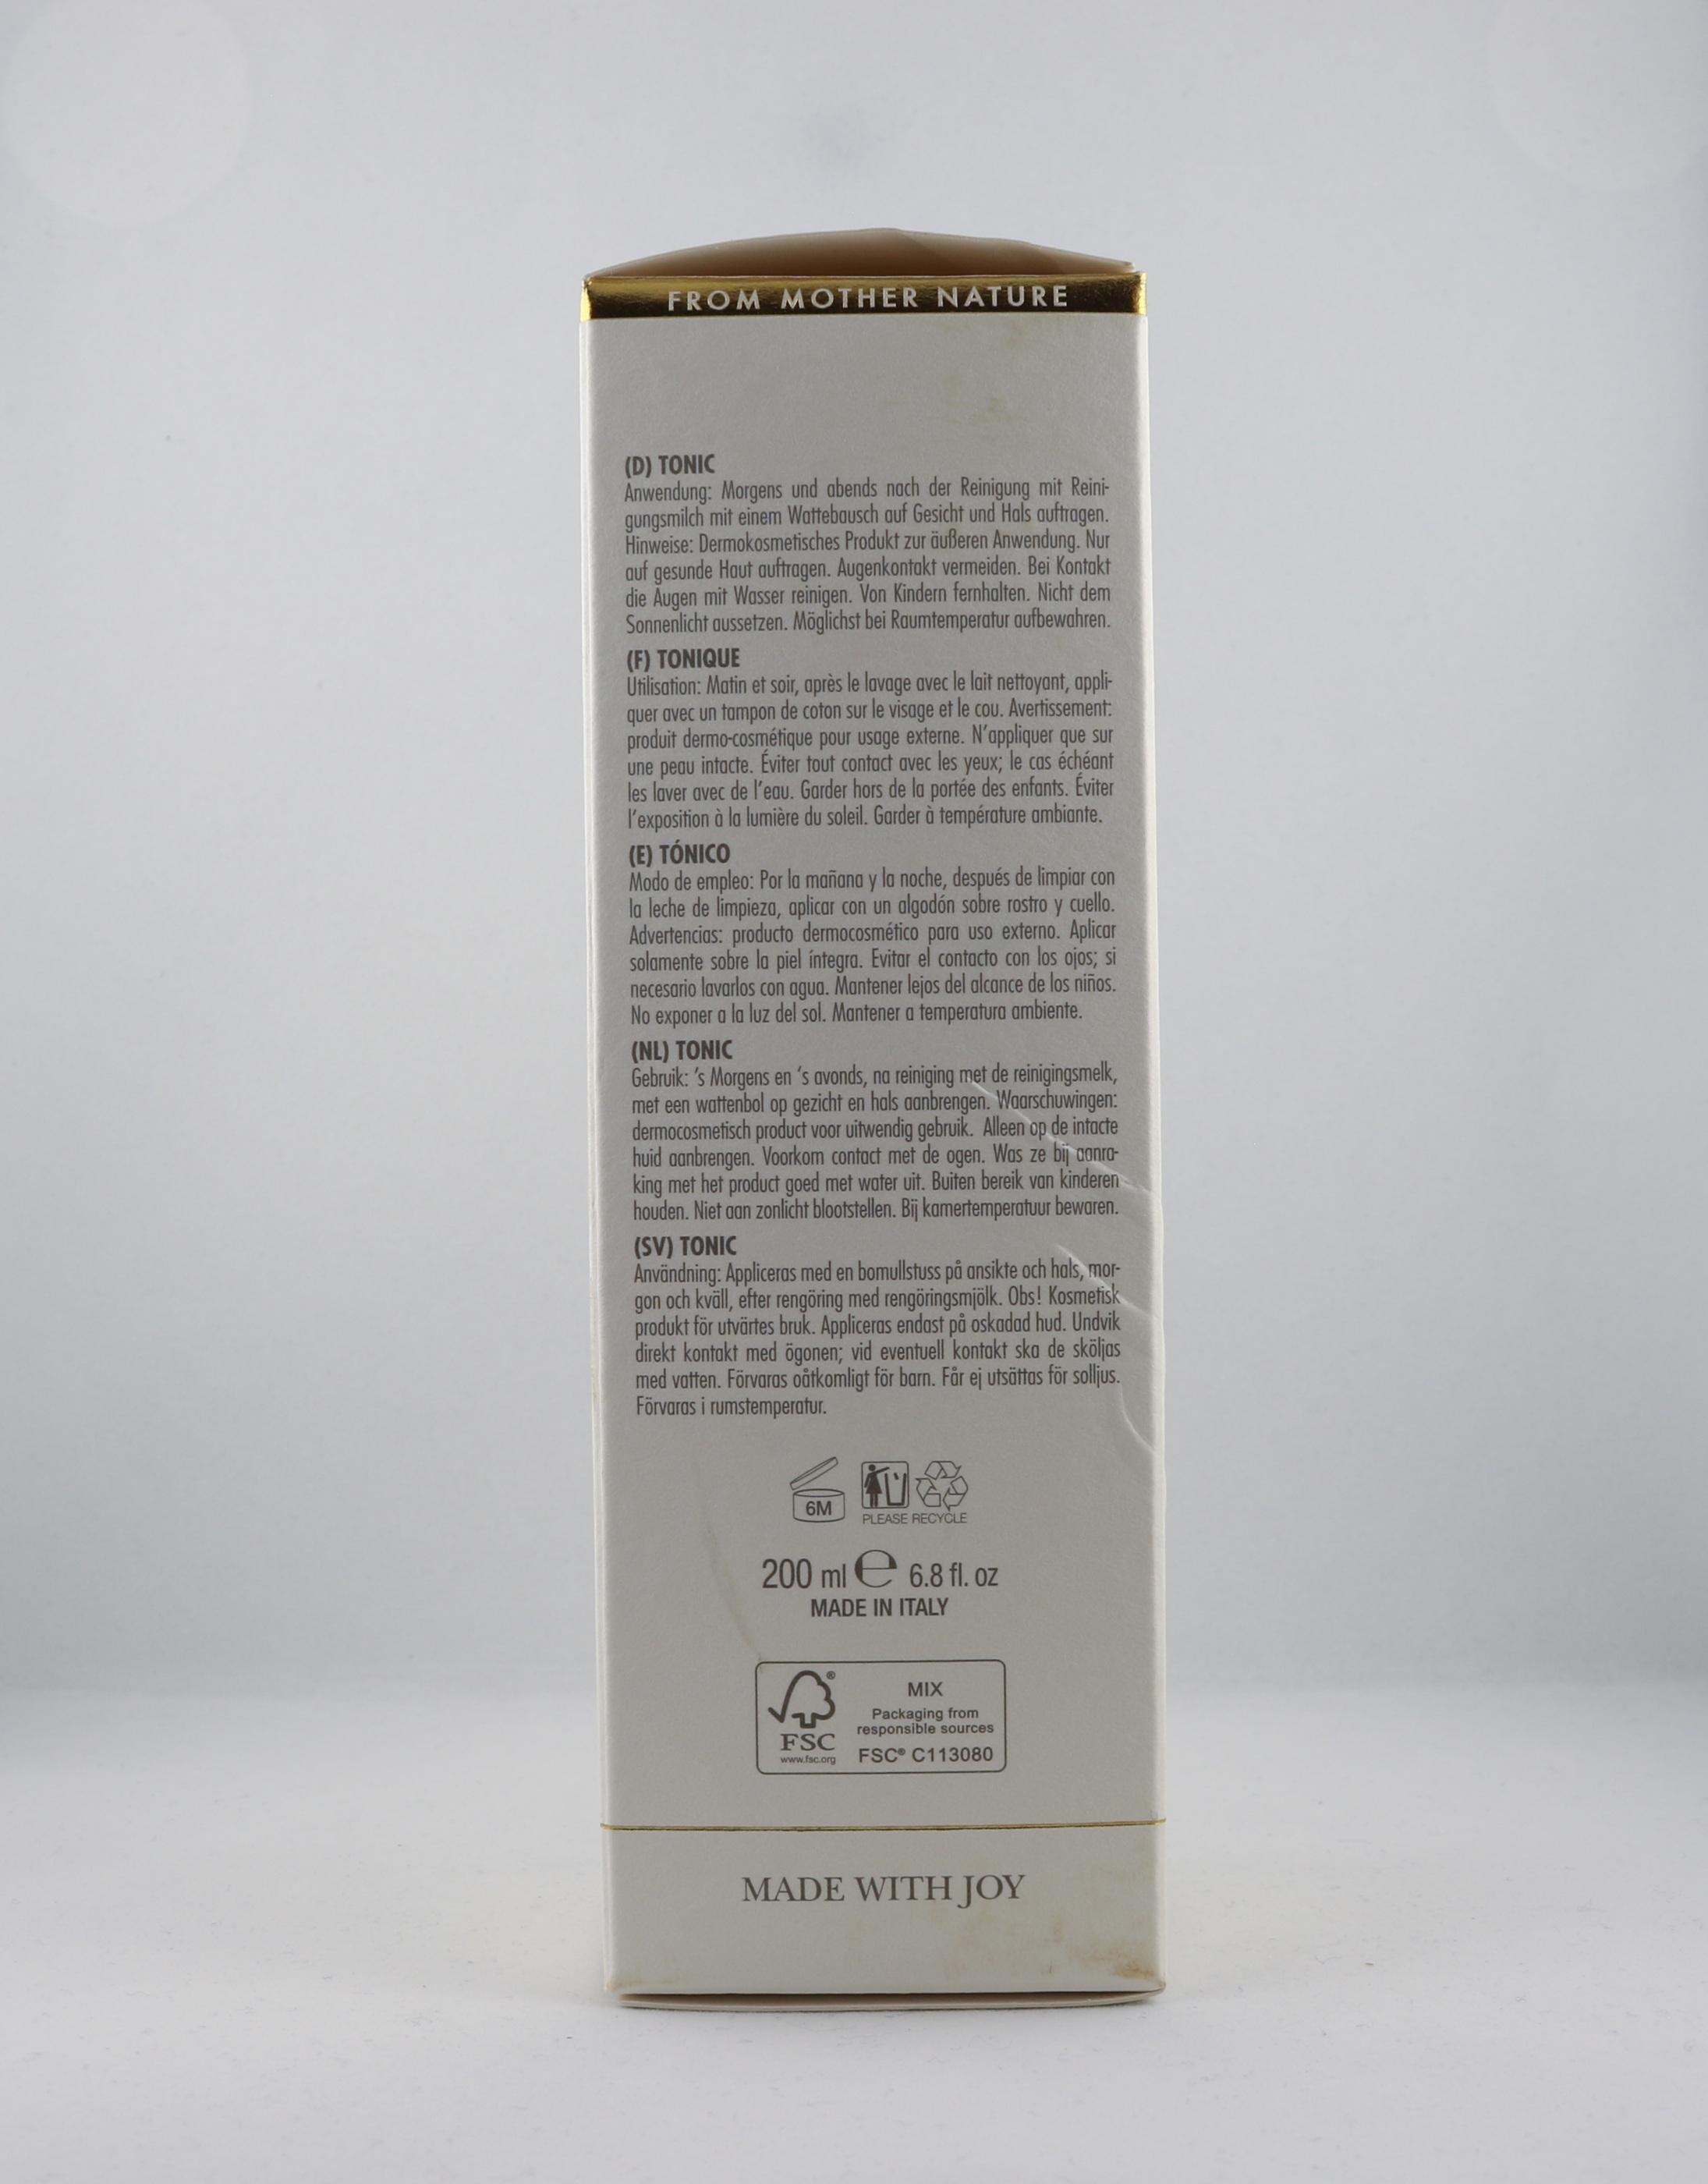 Anti-Age Face Tonic hudvårdsprodukt hudvårdstyp alternativ hälsa wellness ayurveda hudvård